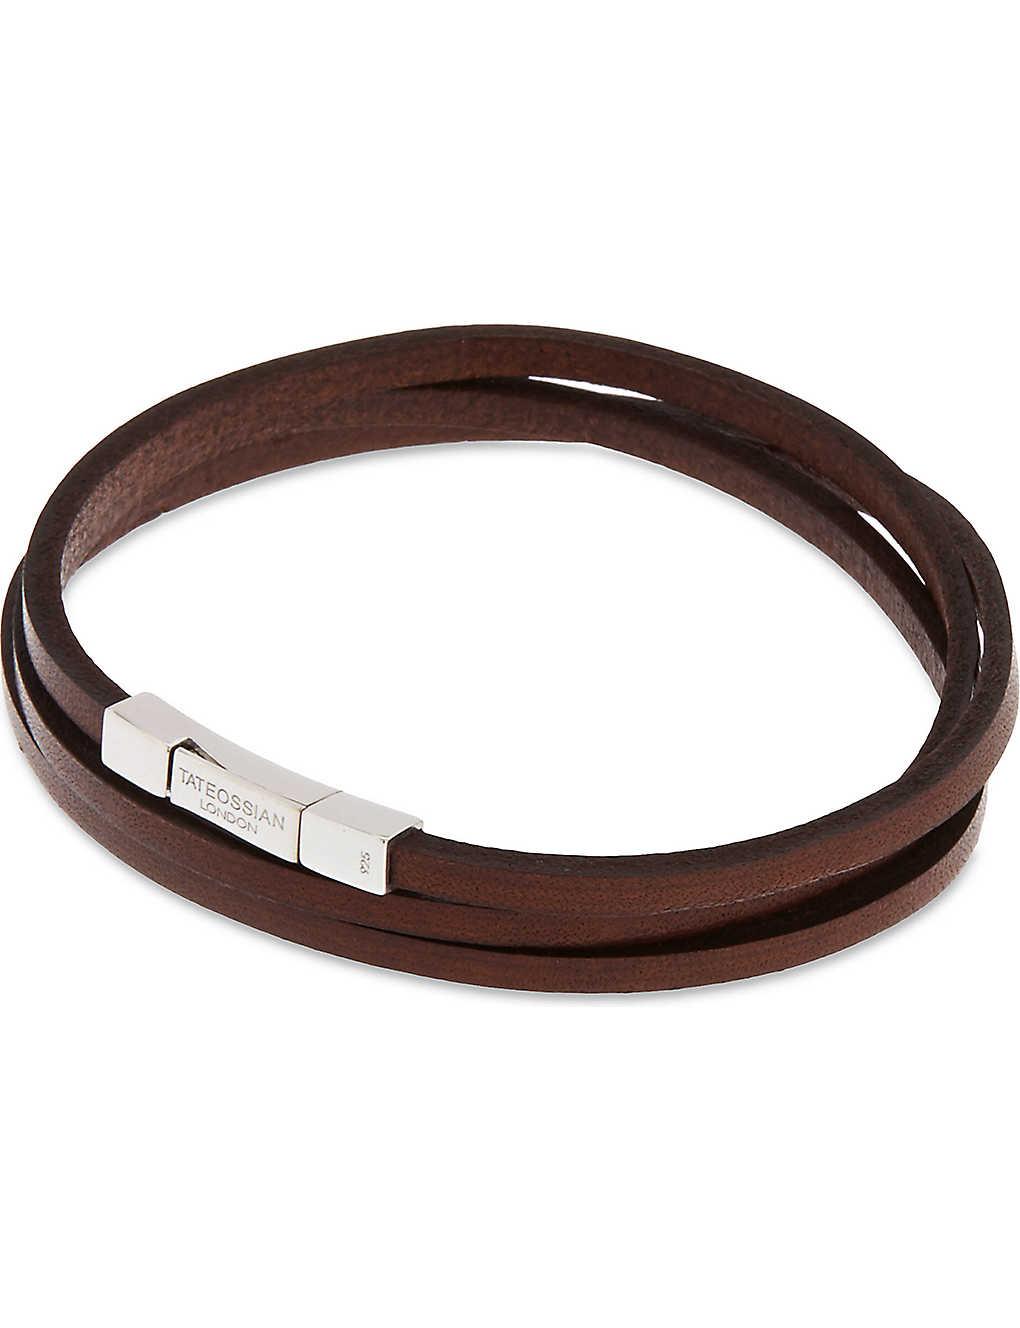 5475e3168 TATEOSSIAN - Leather double-wrap bracelet   Selfridges.com